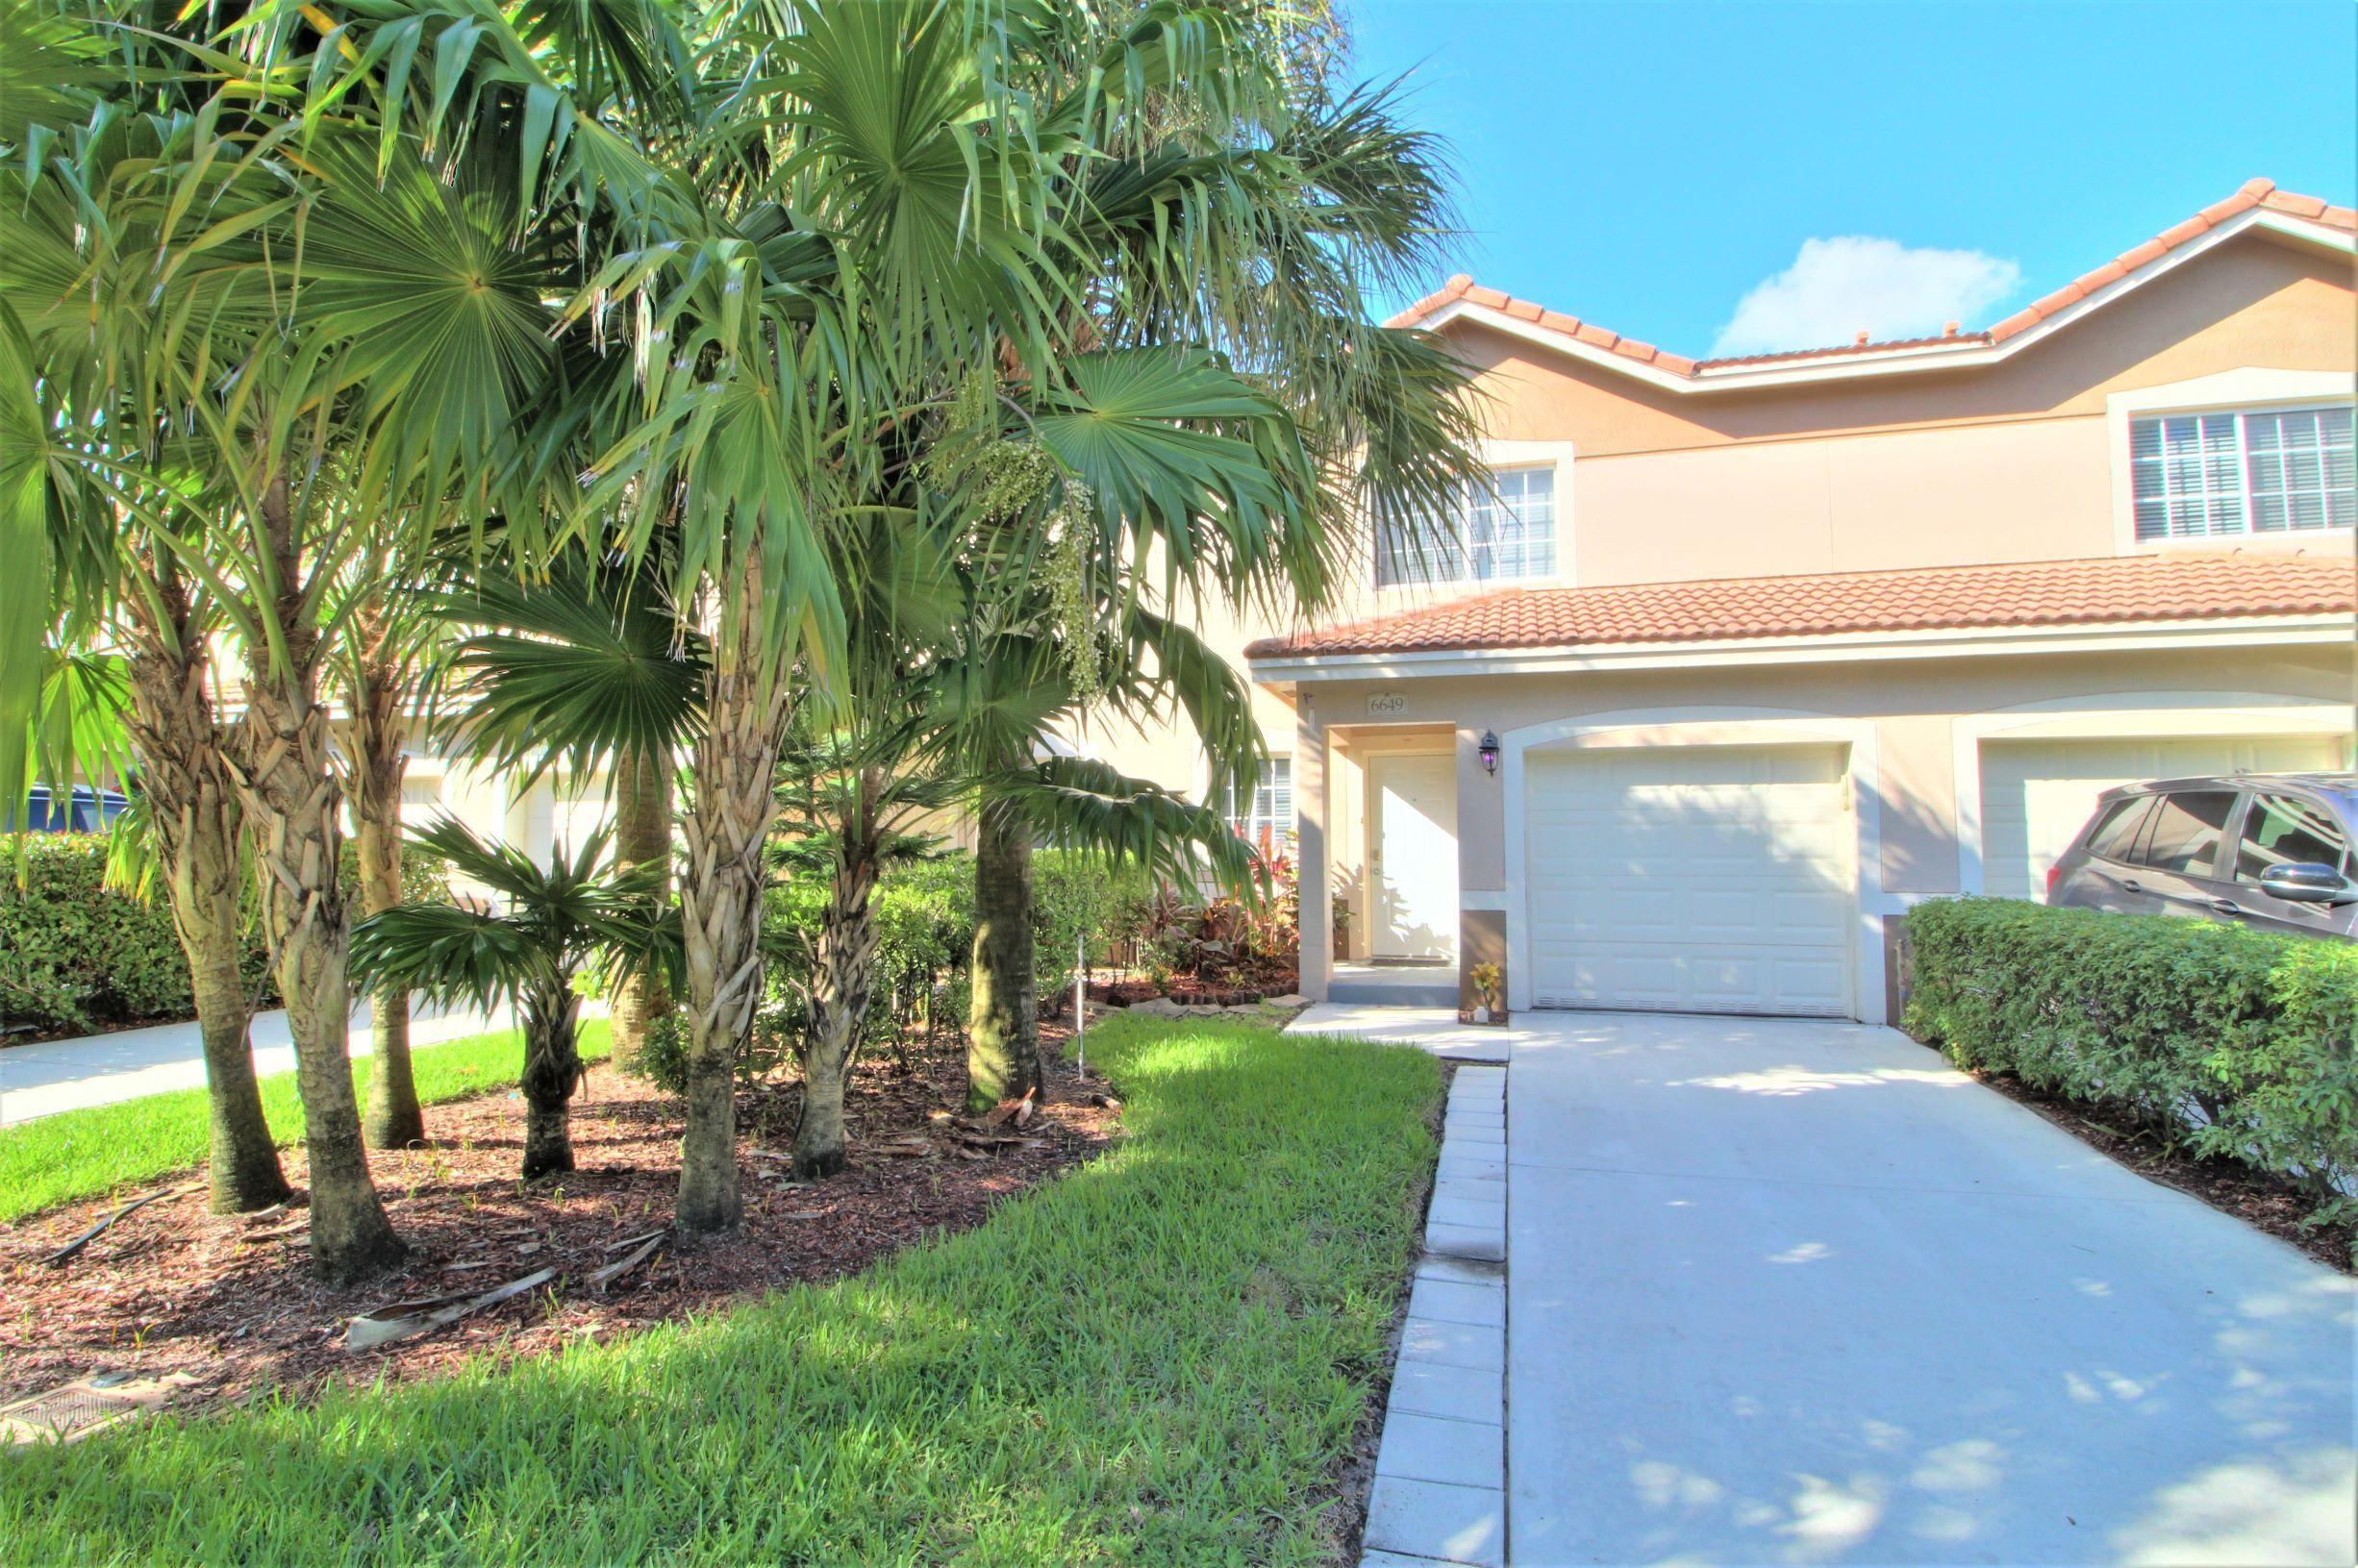 6649 Old Farm Trail, Boynton Beach, Florida 33437, 3 Bedrooms Bedrooms, ,2 BathroomsBathrooms,Rental,For Rent,Old Farm,RX-10574666